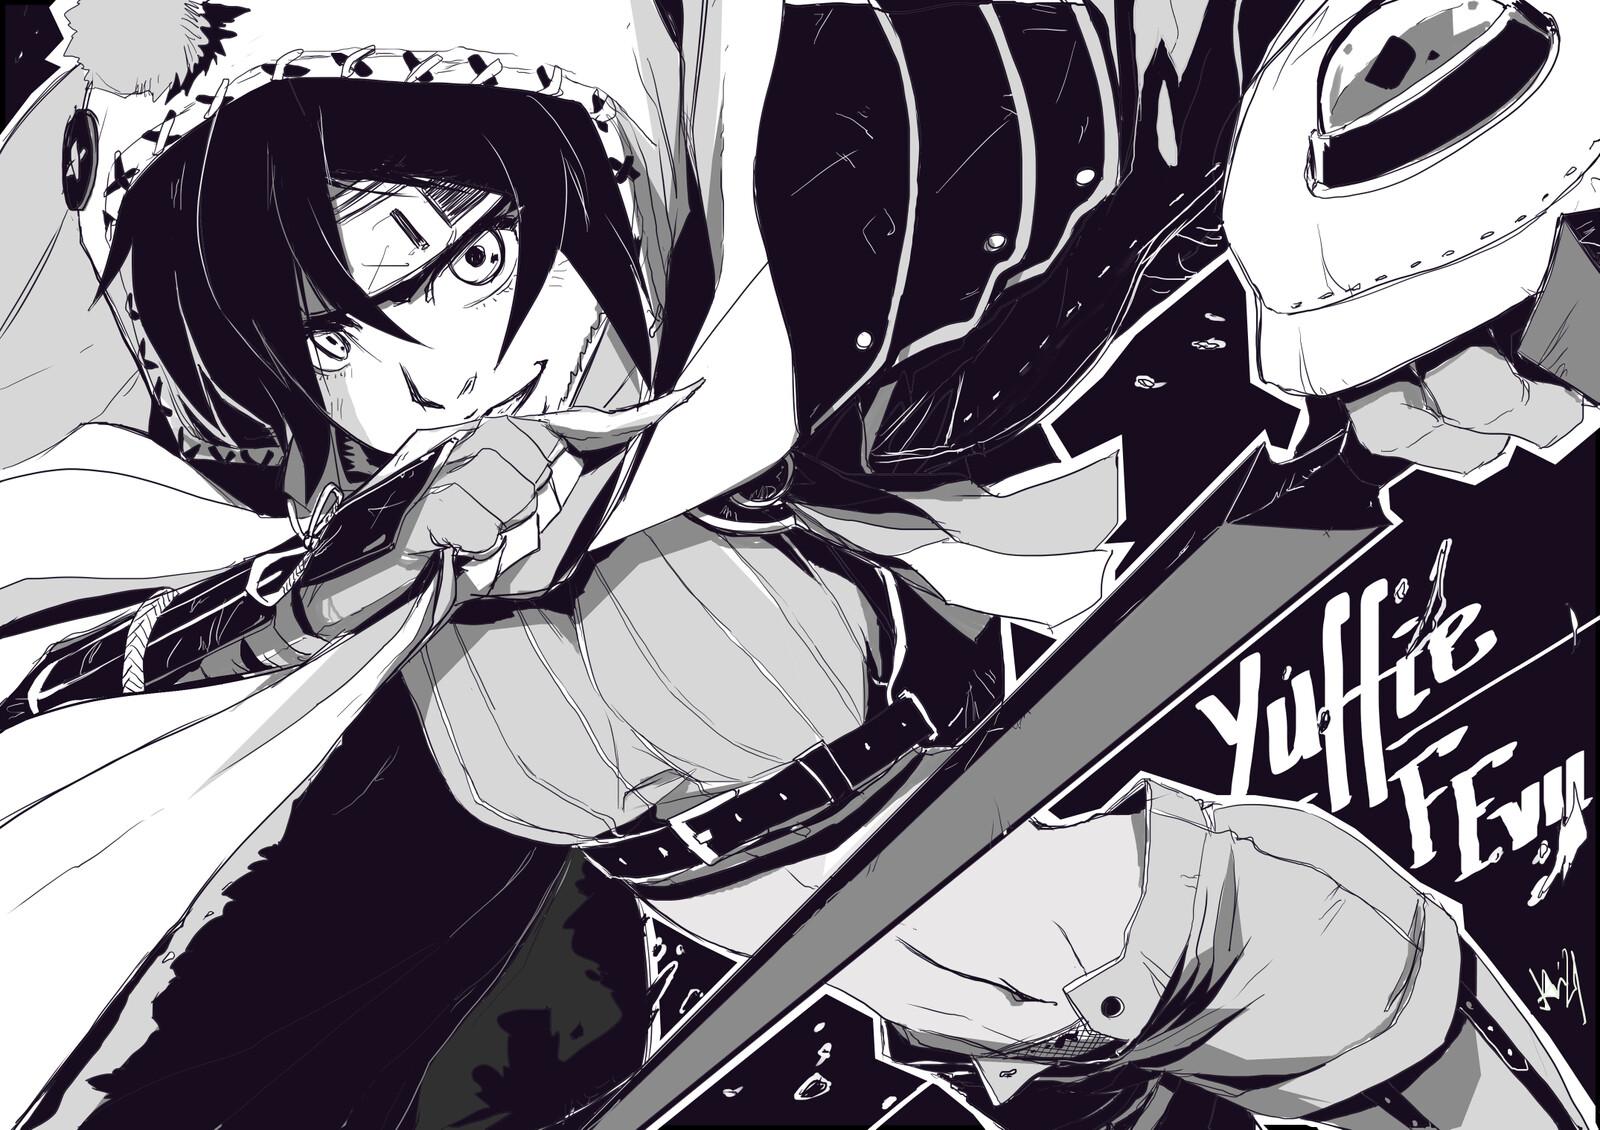 FF7R - Yuffie Kisaragi